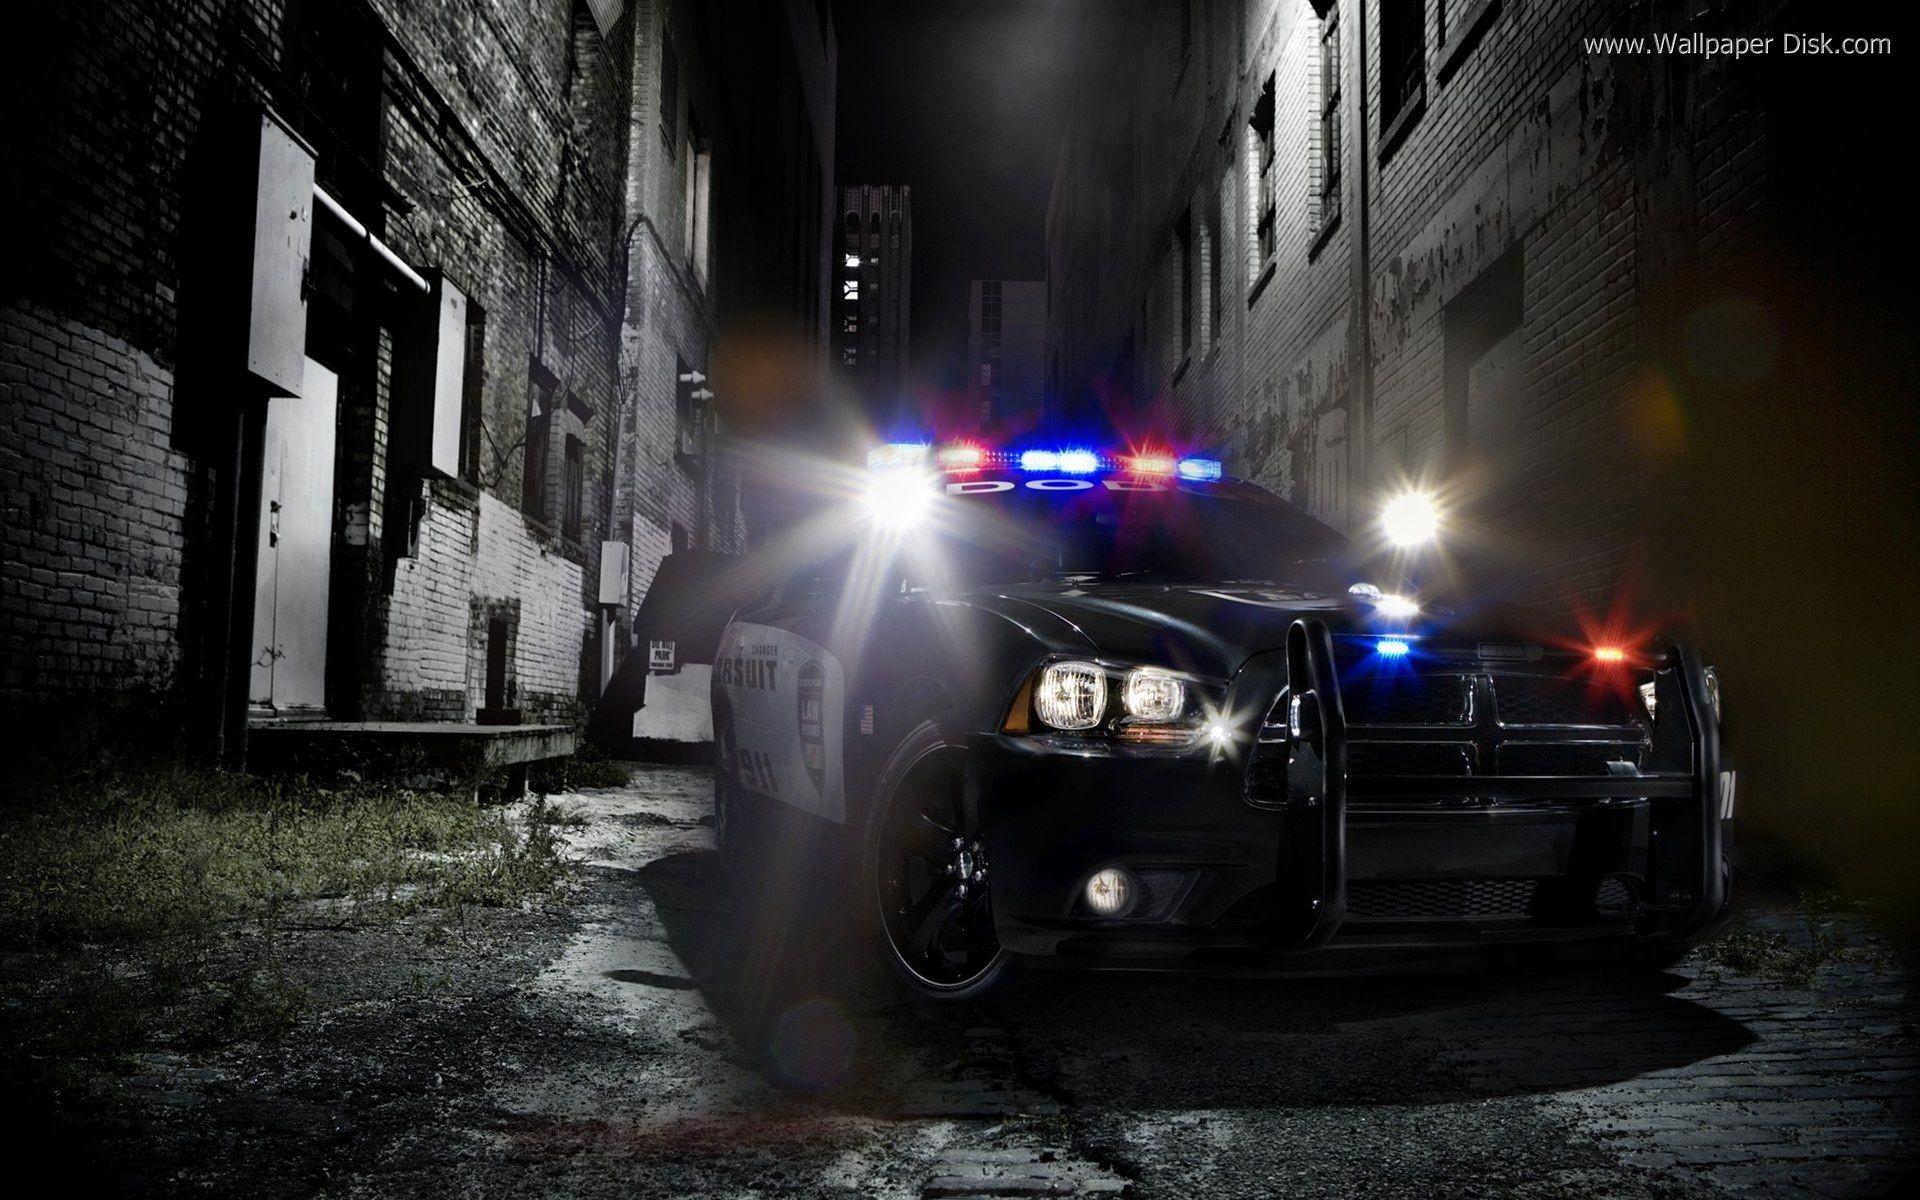 A.C.A.B Wallpaper (All Cops Are Bastards) by IATutorials on DeviantArt |  Adorable Wallpapers | Pinterest | Wallpaper